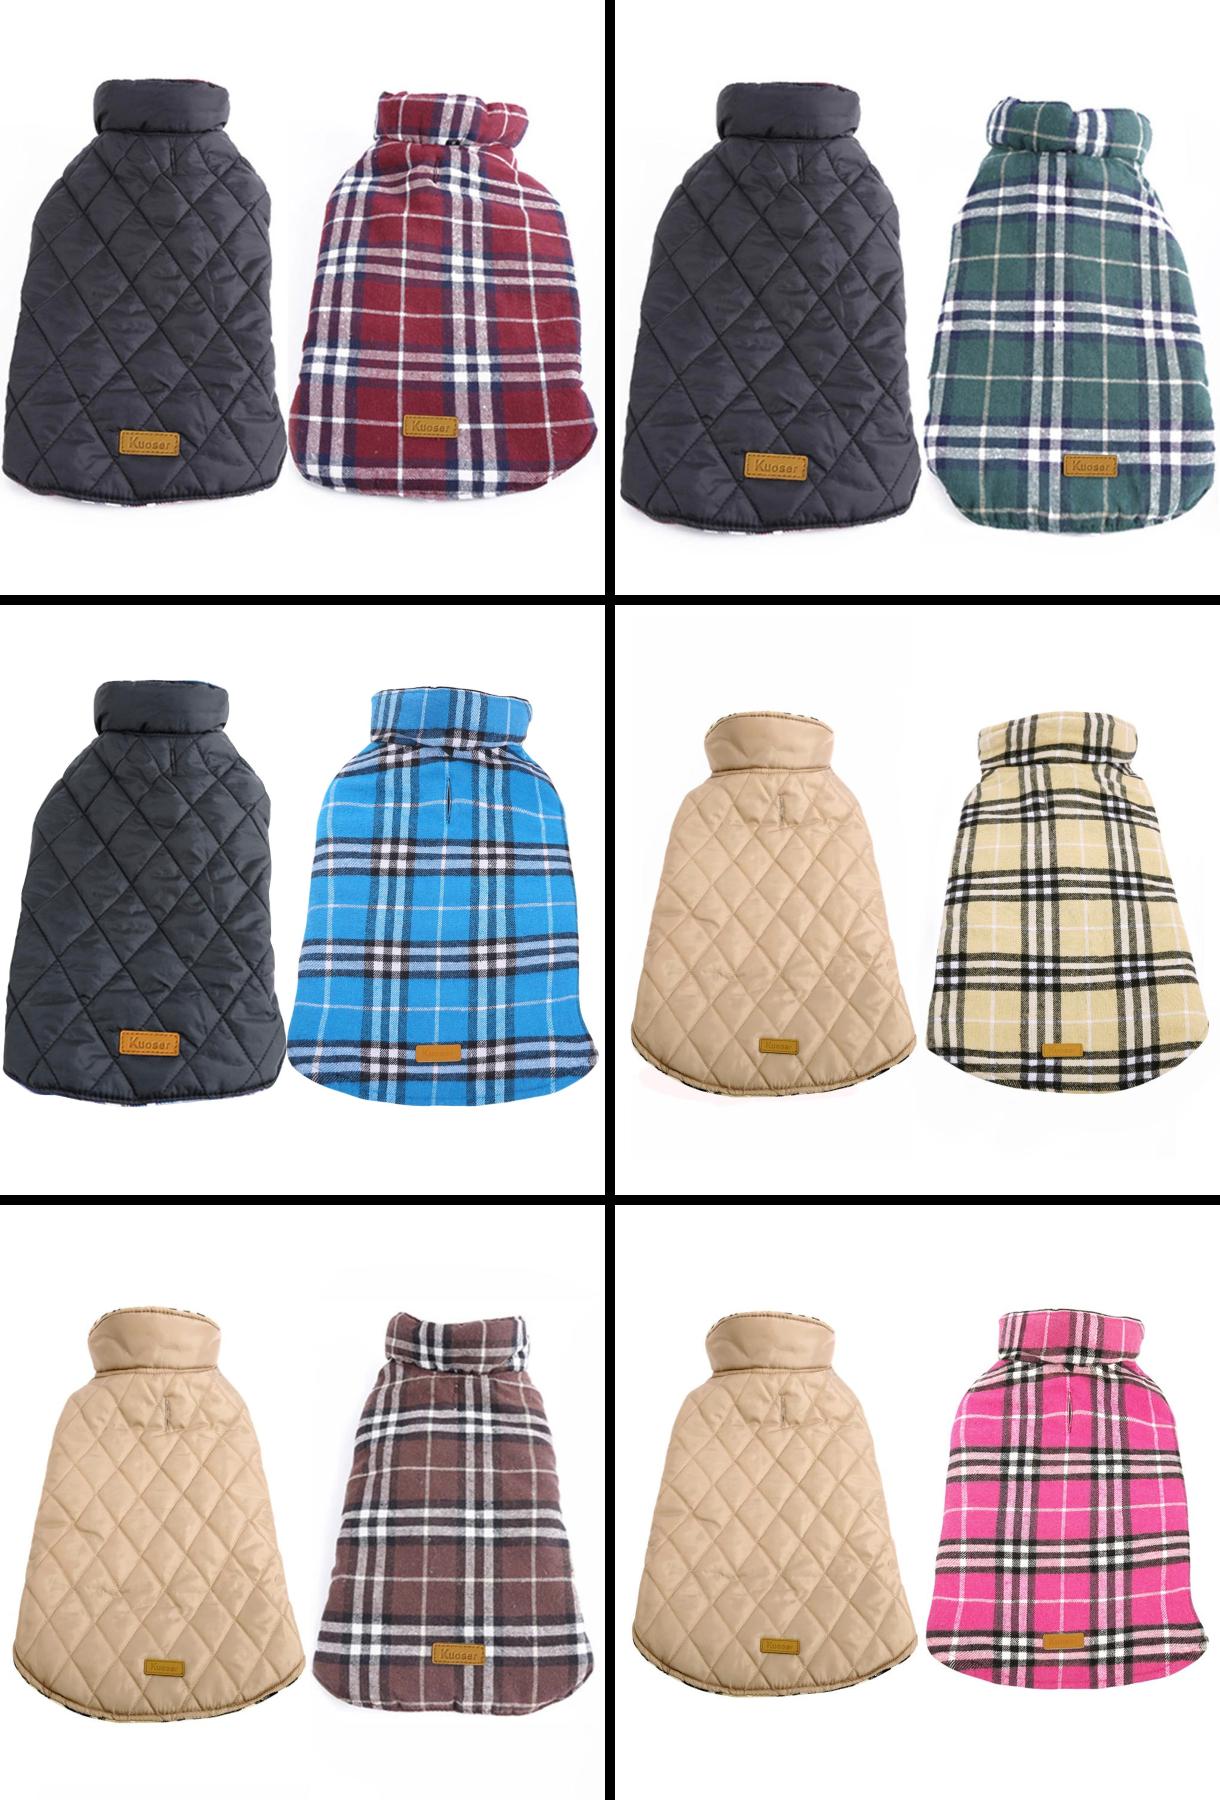 Warm Waterproof Dog Jacket - 6 Different Color Models